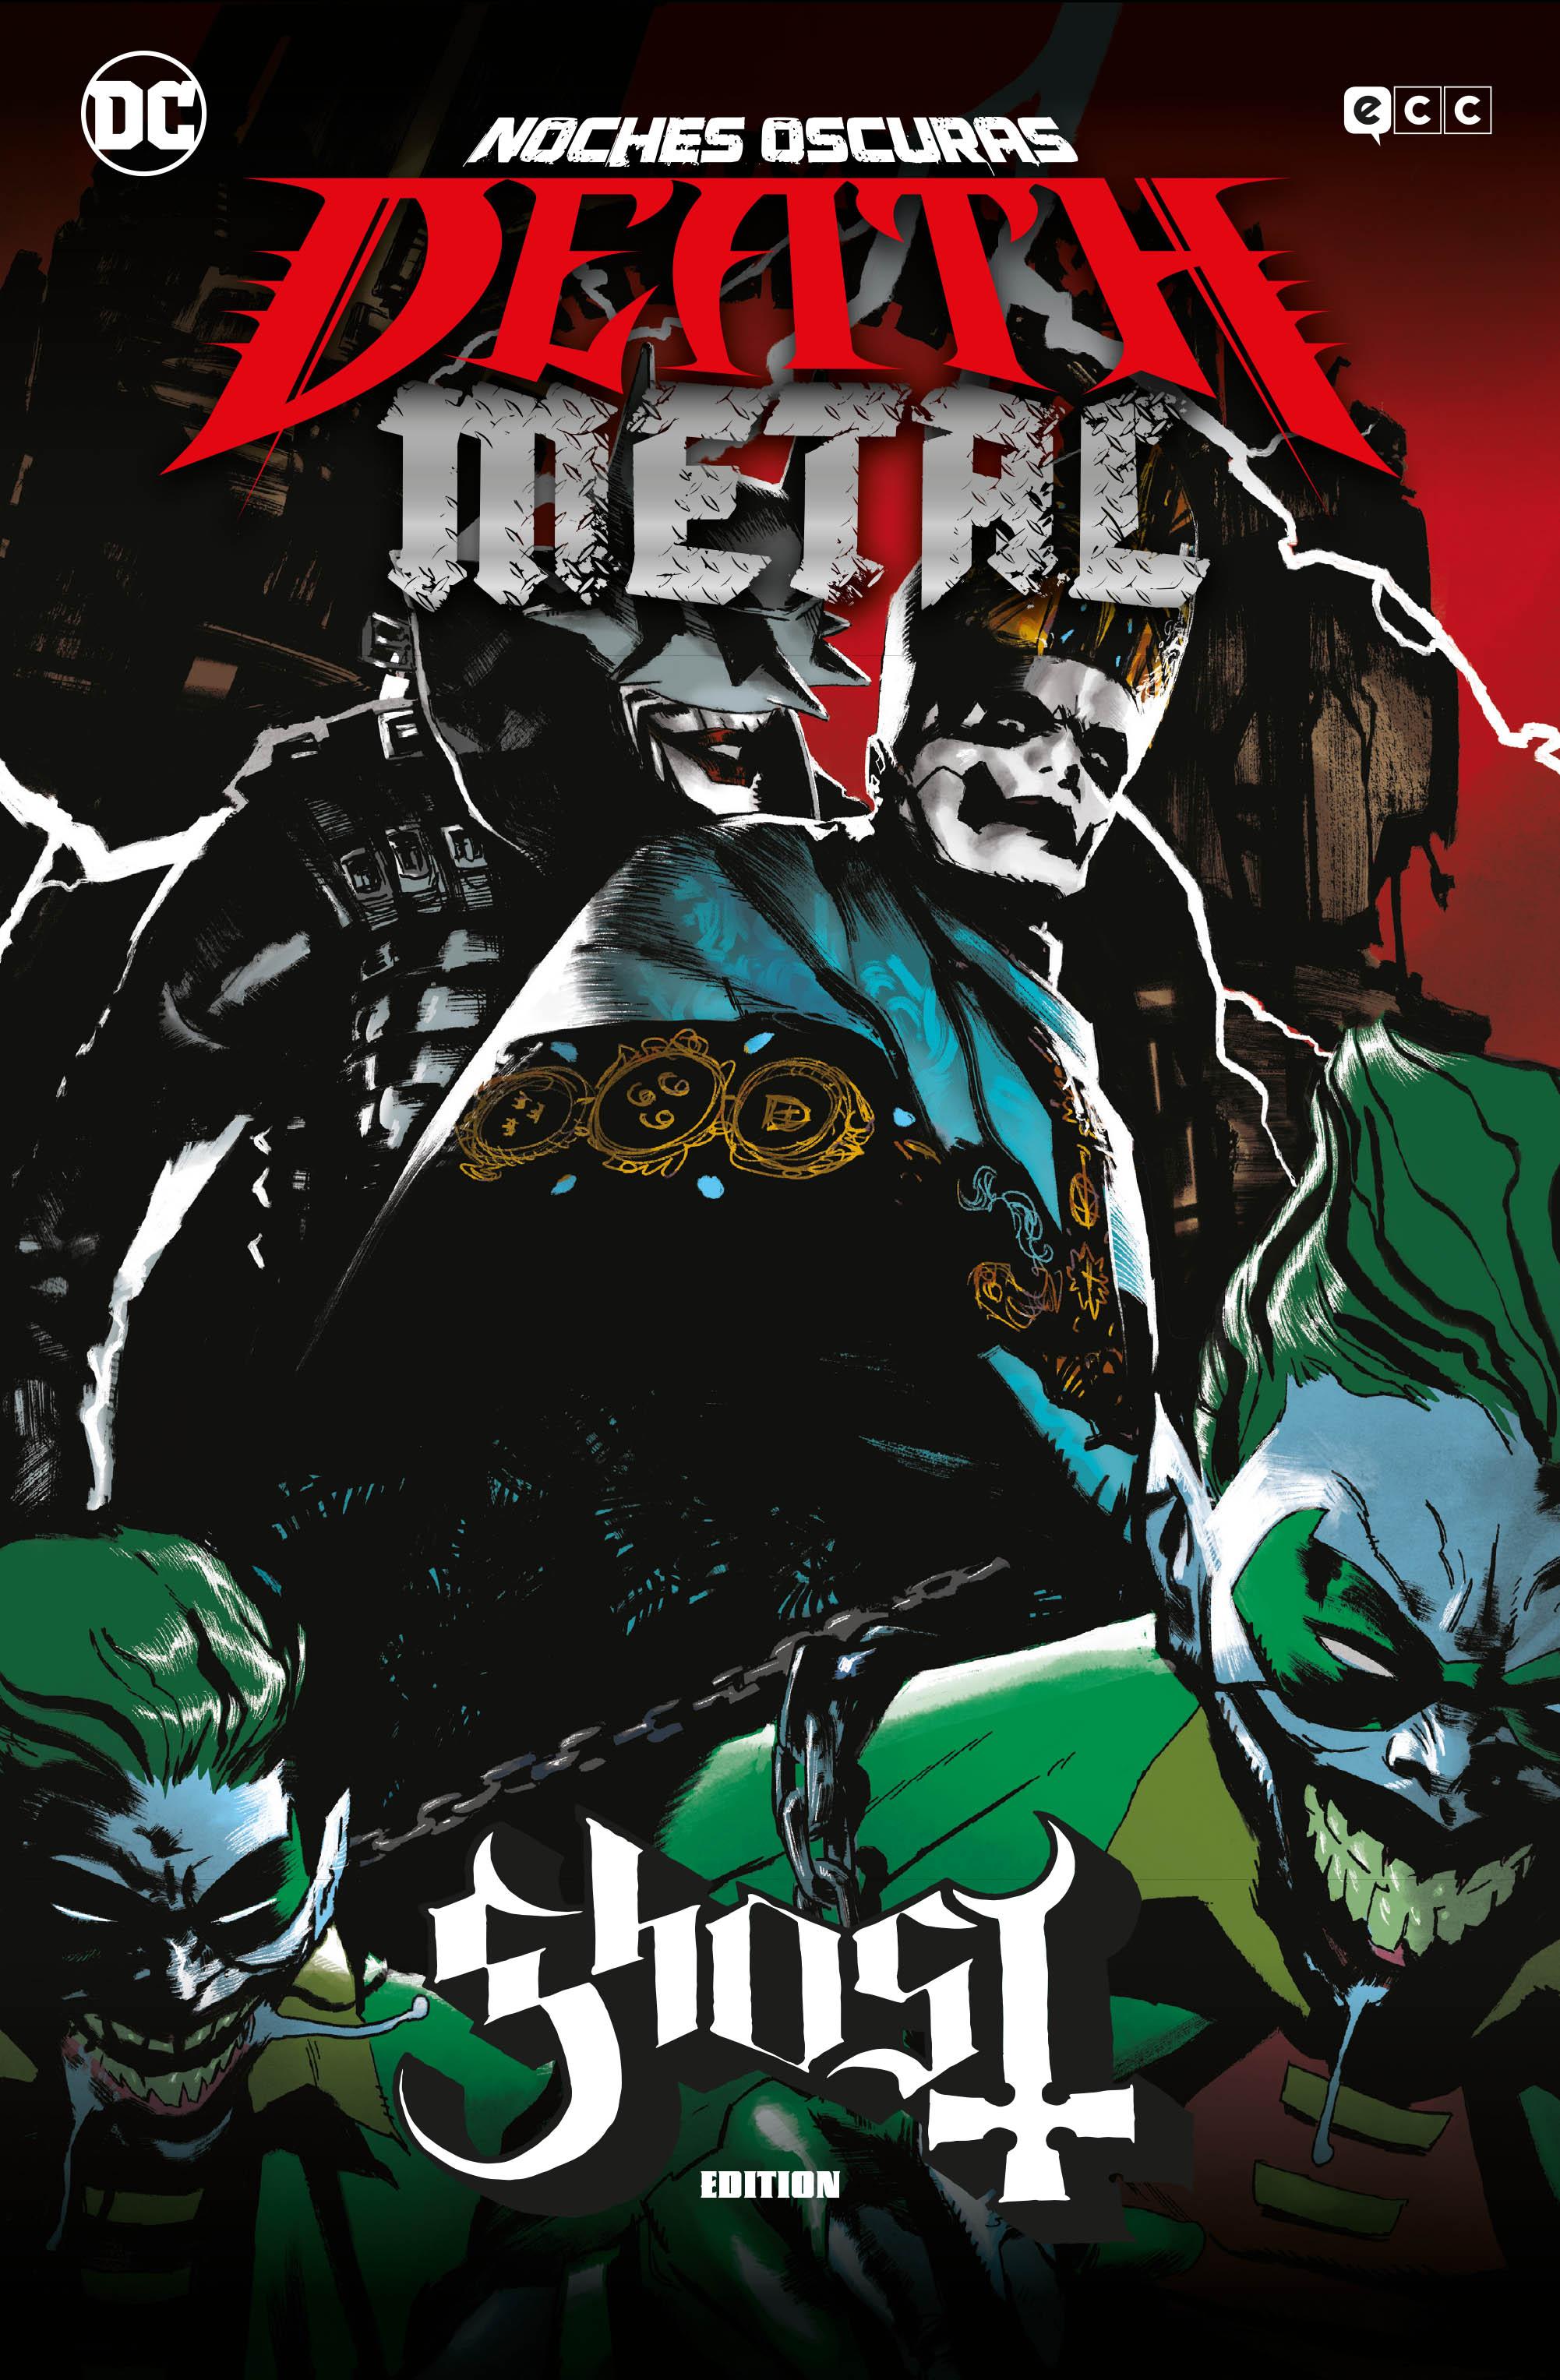 (Rústica) Noches oscuras: Death Metal núm. 02 de 7 (Ghost Band Edition)